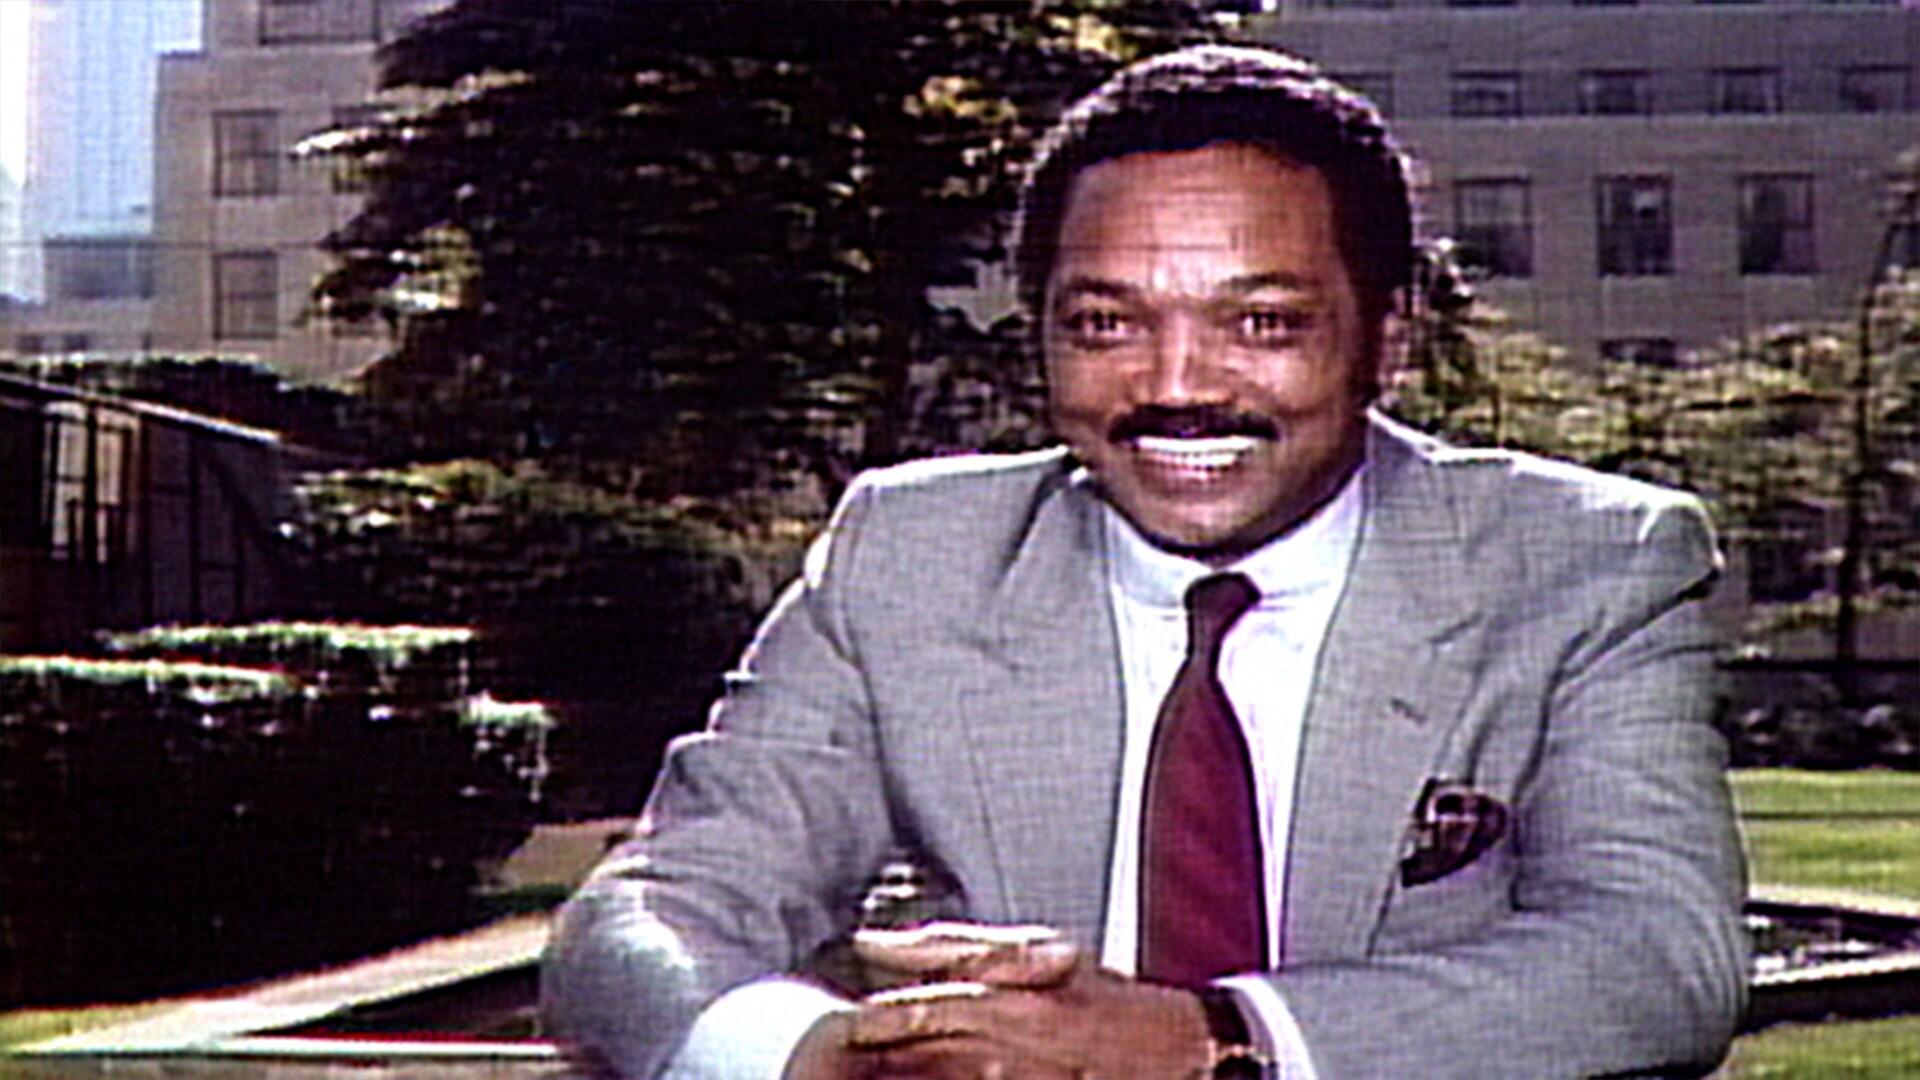 Jesse Jackson: October 20, 1984